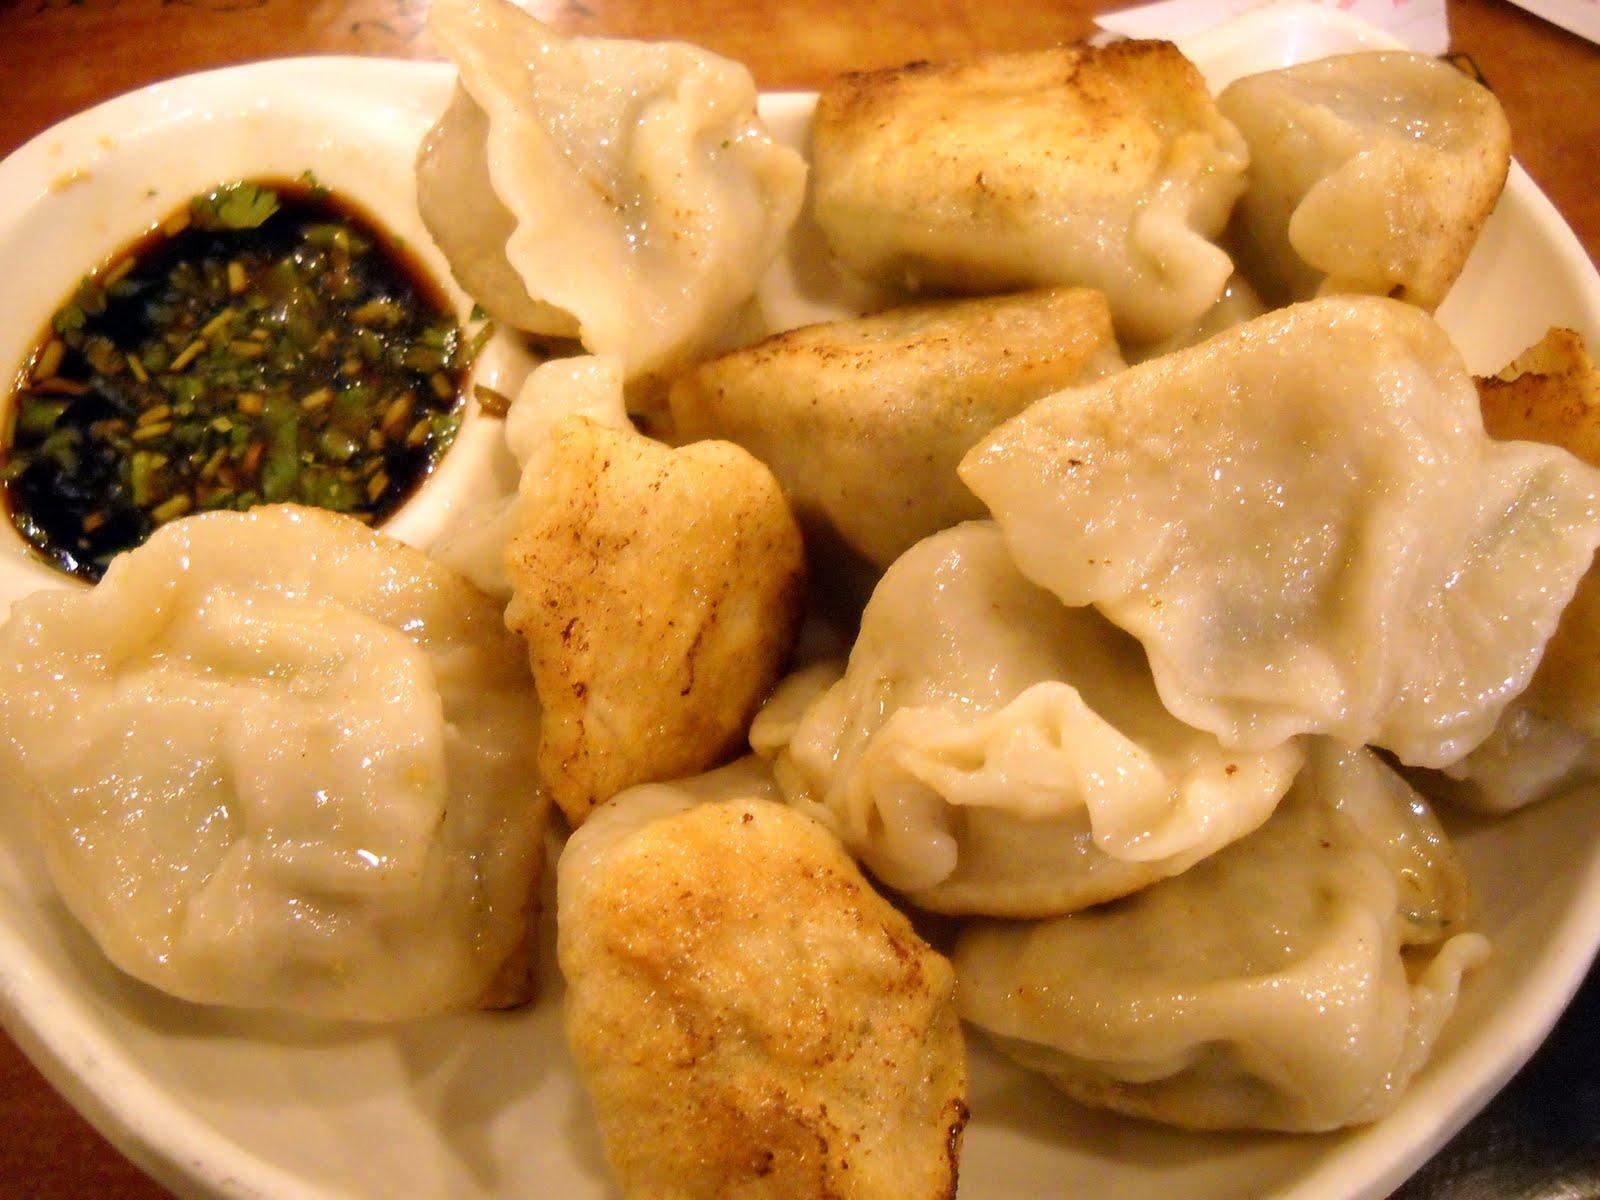 Gourmet Dumpling House, Chinatown, Boston – BakingMeHungry